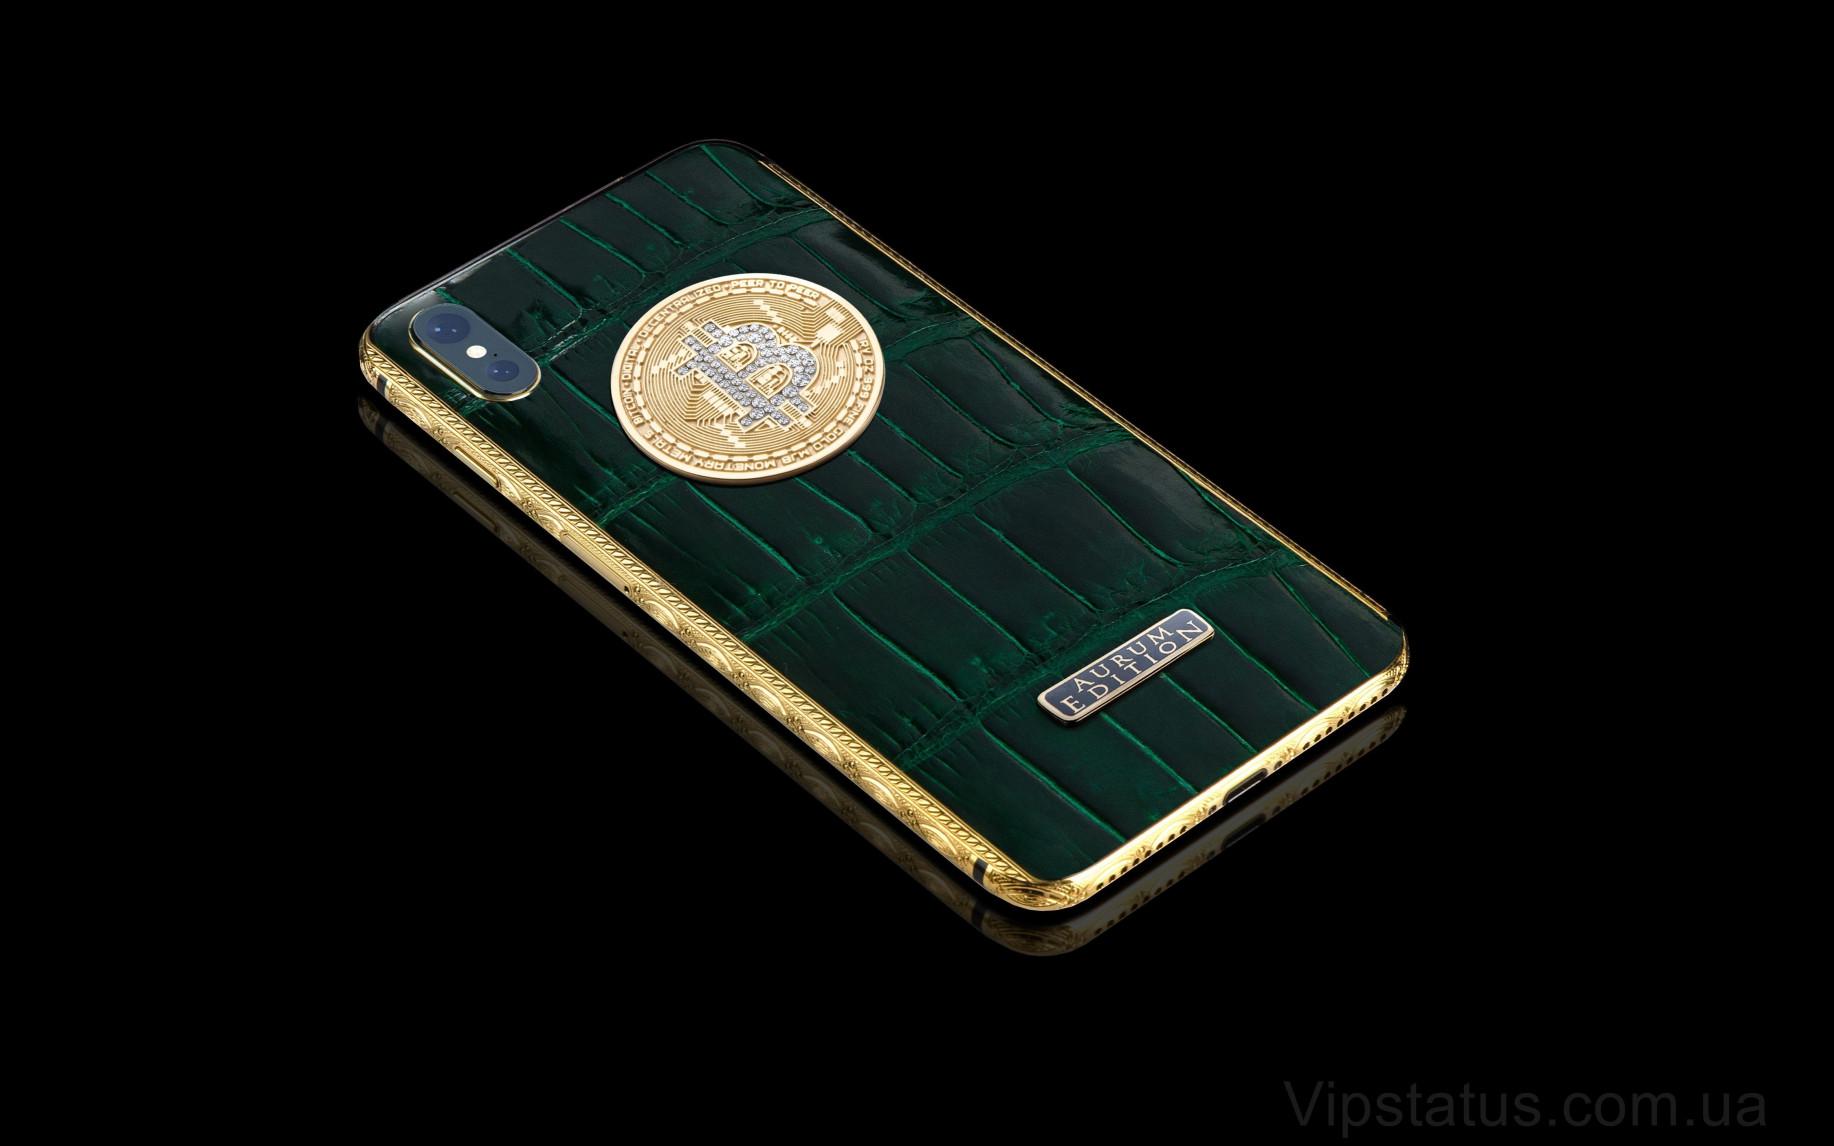 Elite Great Bitcoin Diamond IPHONE 11 PRO 512 GB Great Bitcoin Diamond IPHONE 11 PRO 512 GB image 2